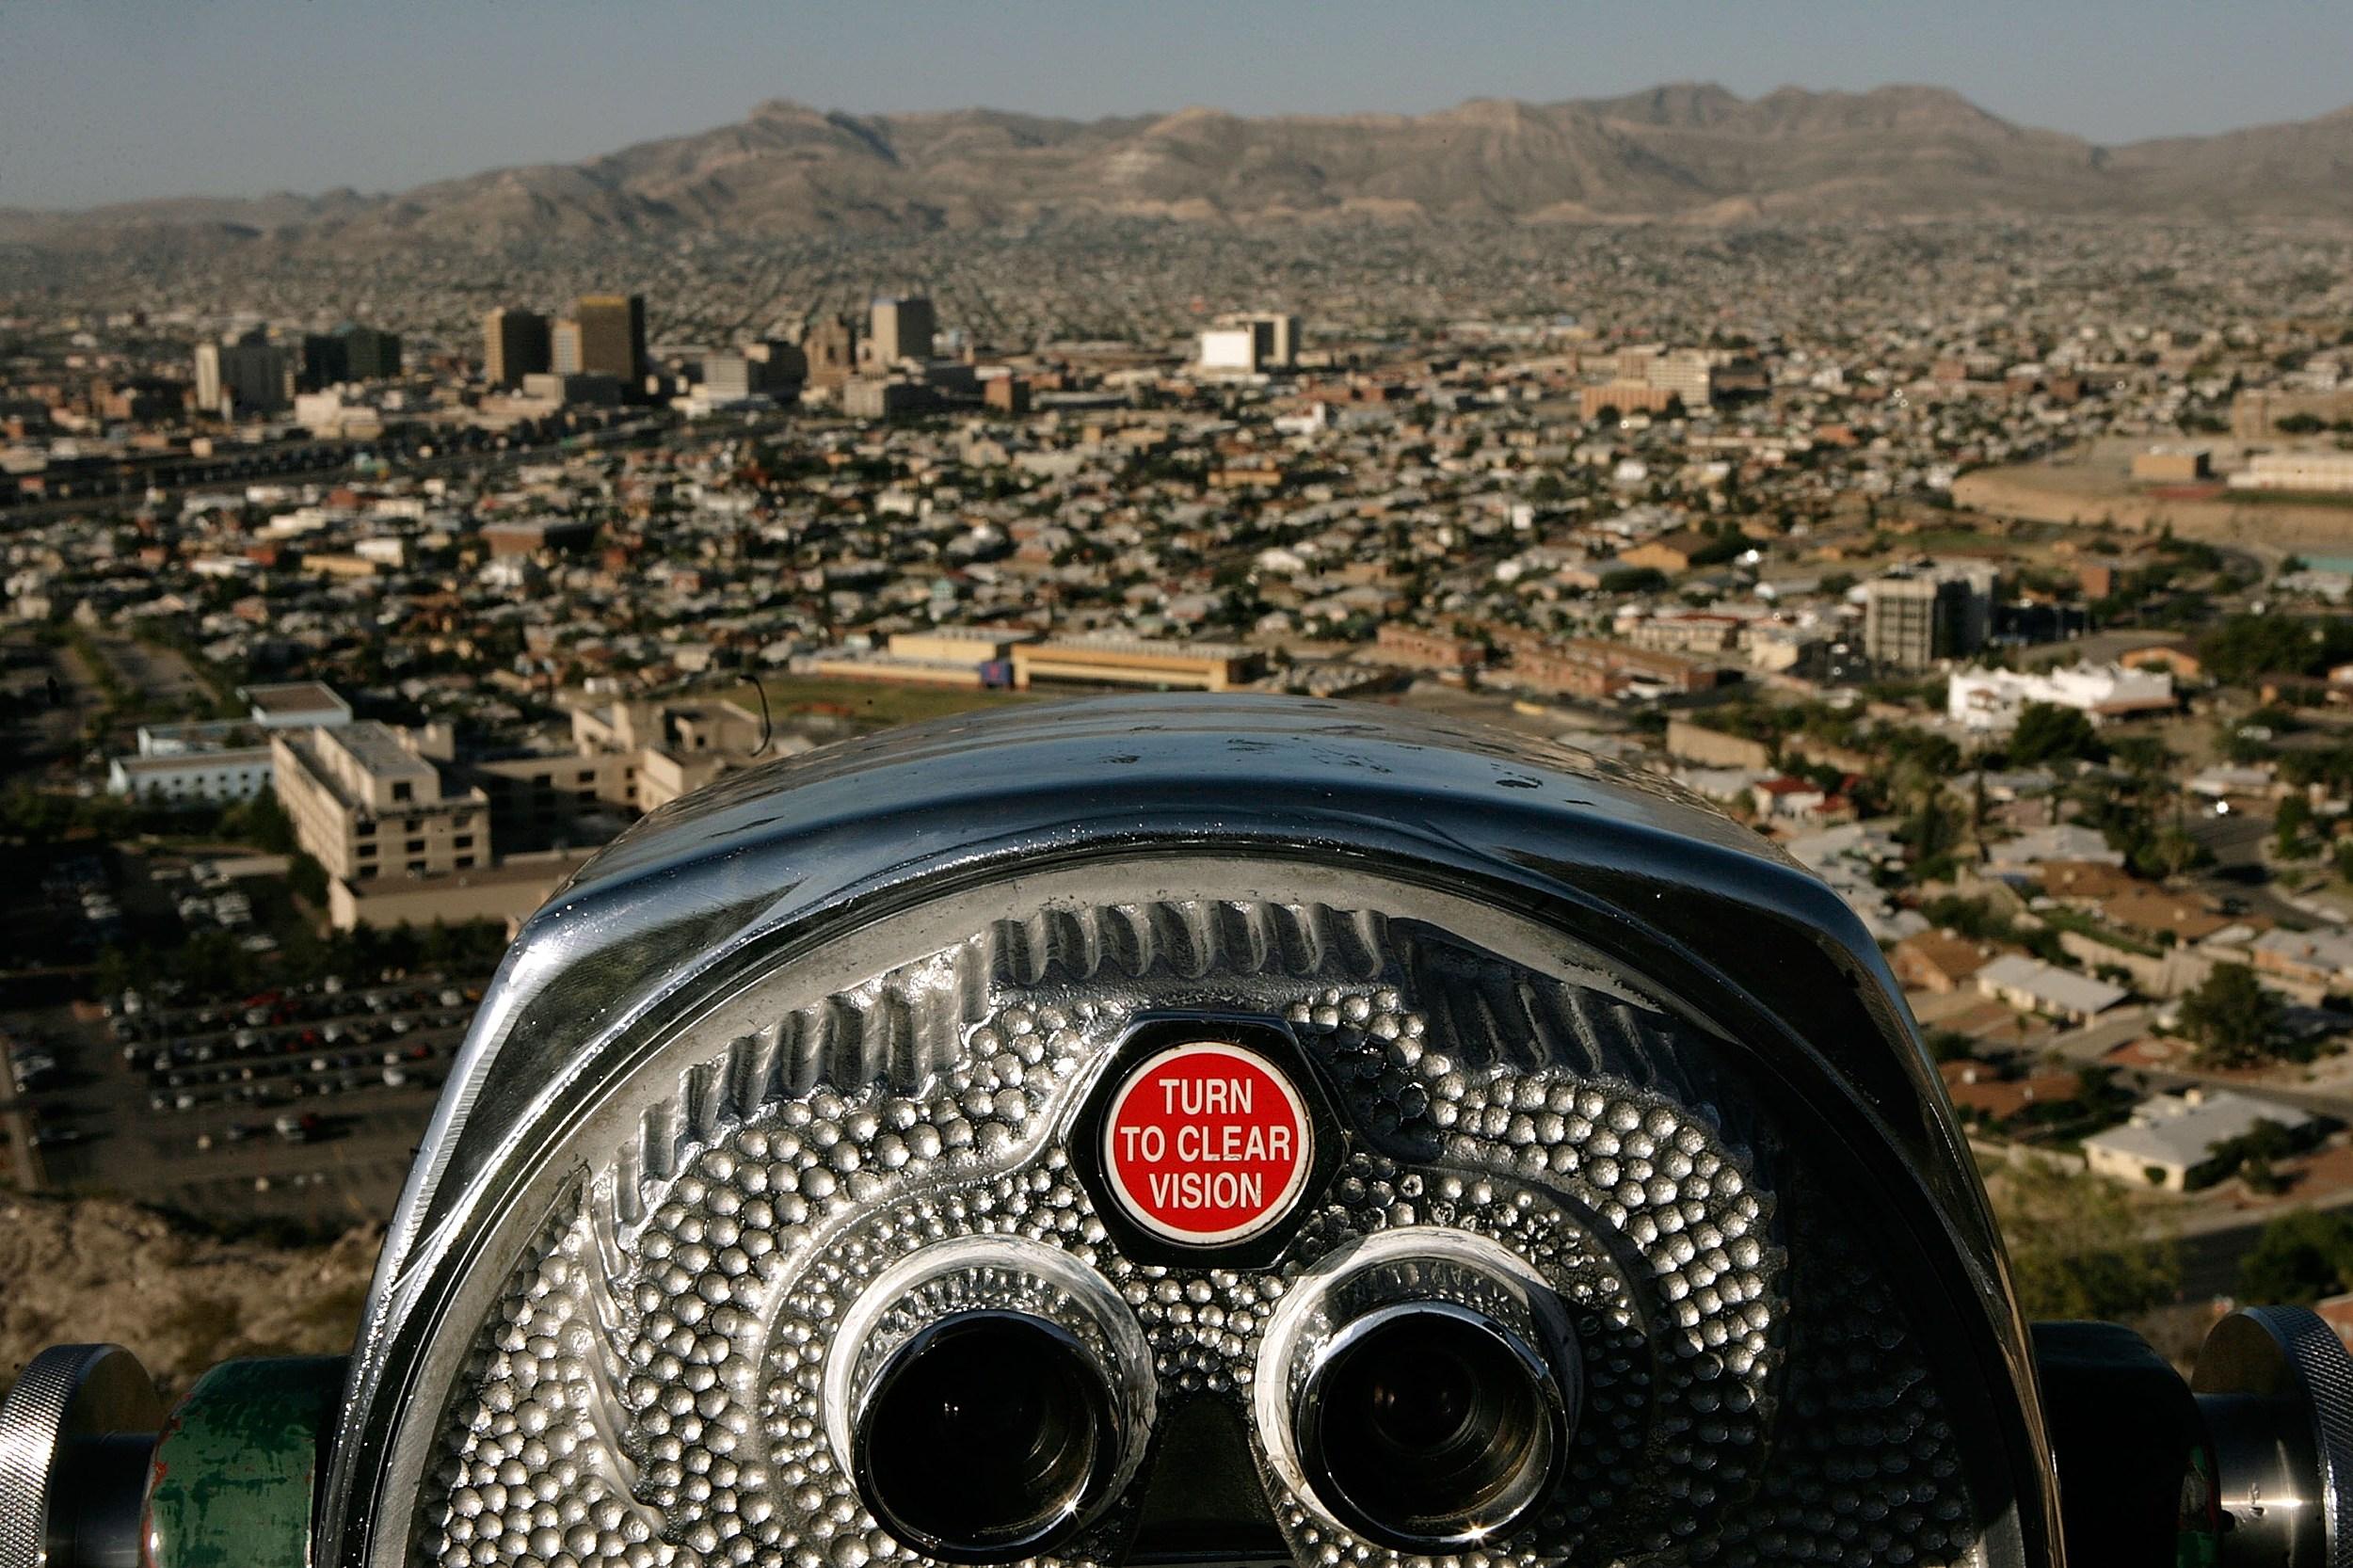 Dumb And Dumber Scenes Shot In El Paso